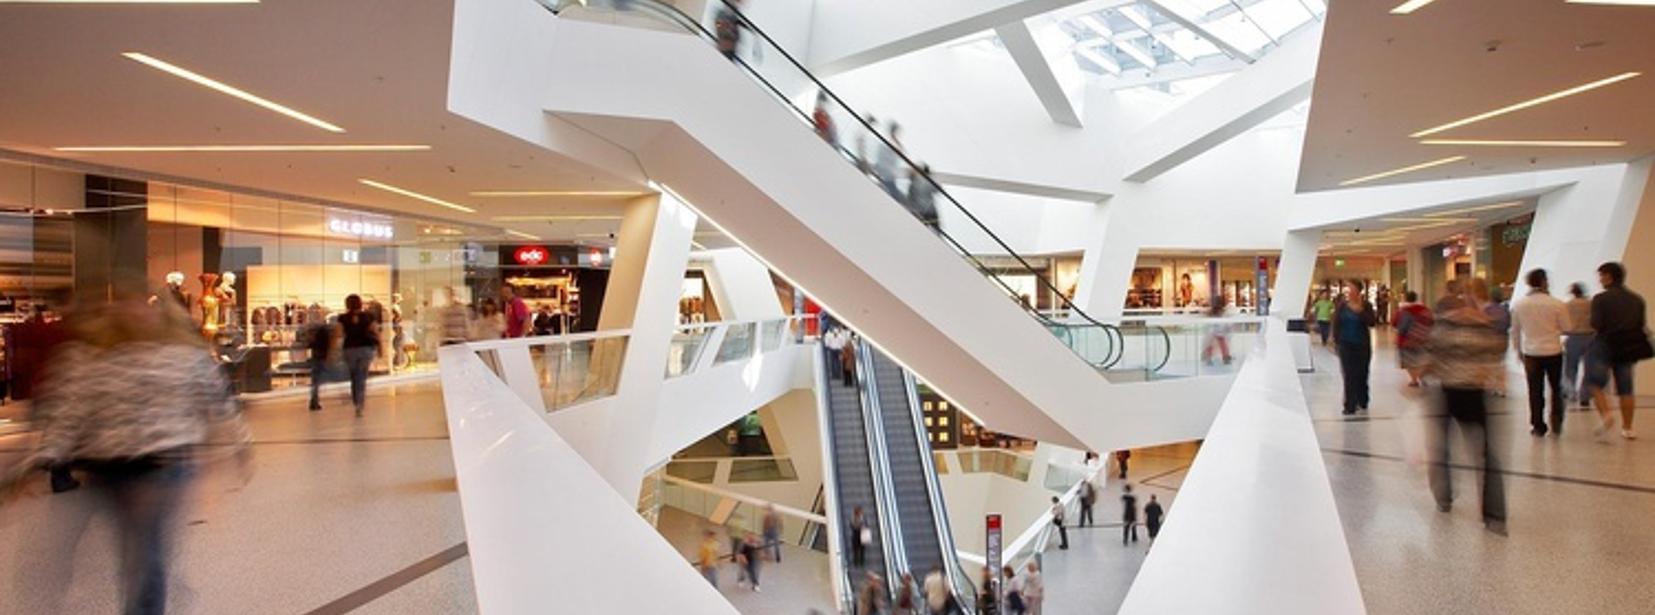 Westside Shopping Erlebniscenter Berne MyCityHighlight